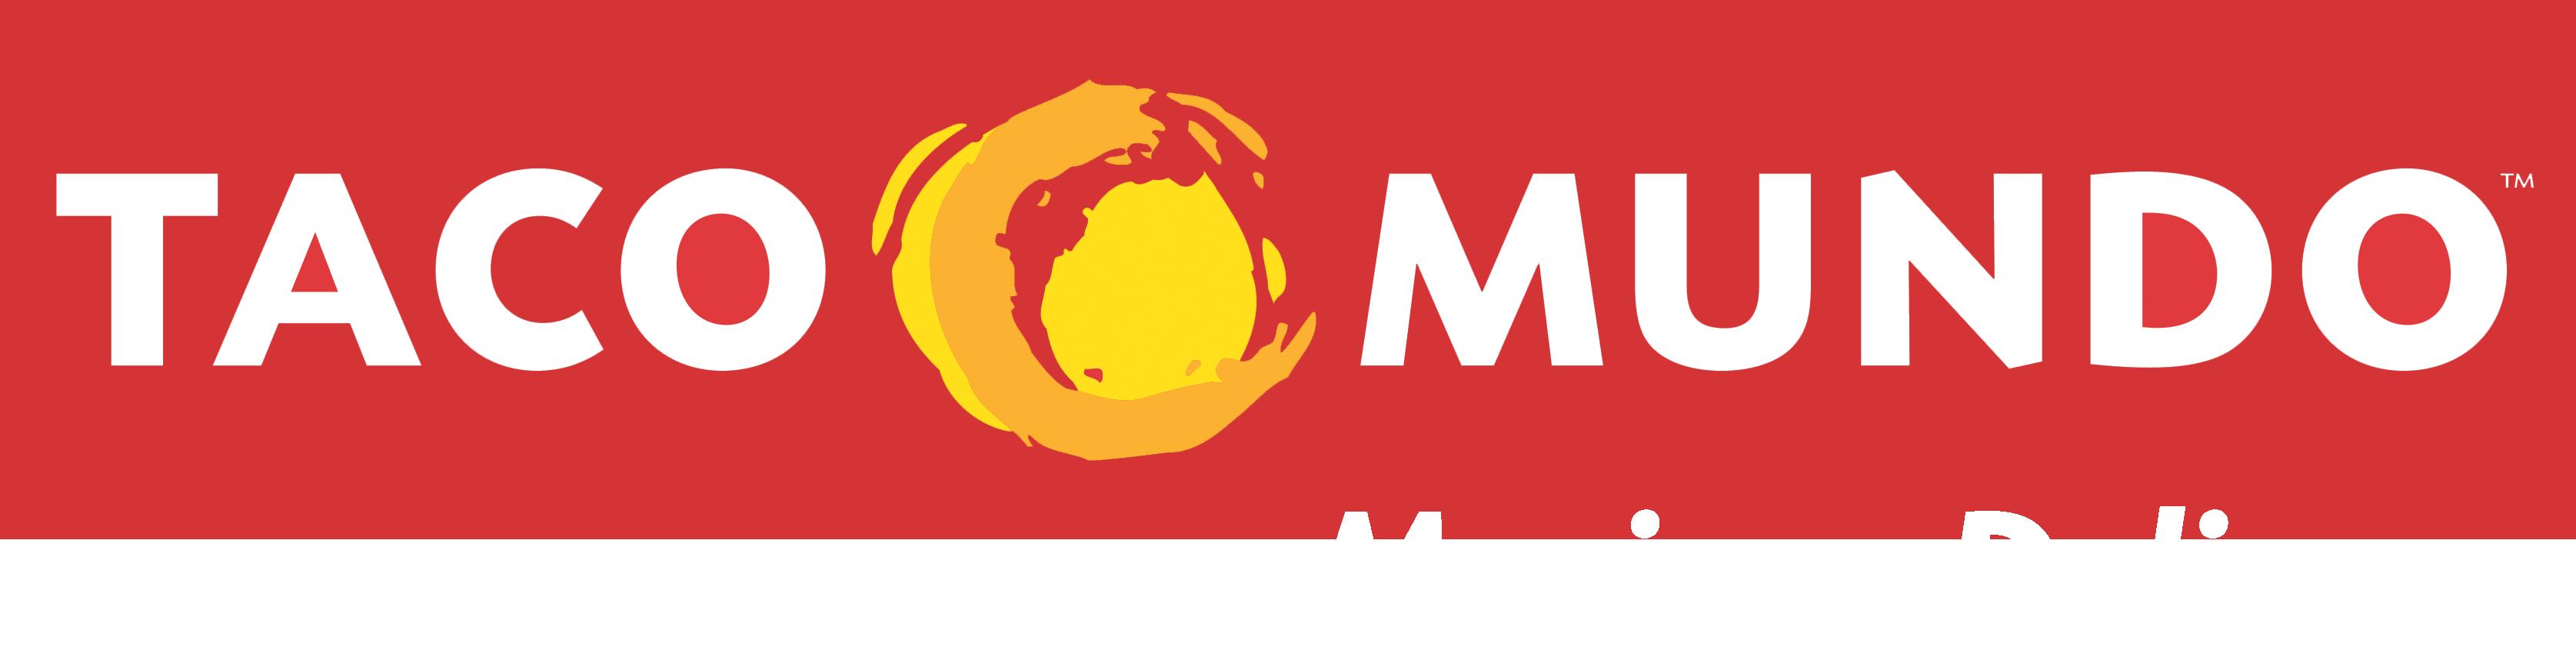 Taco Mundo Logo